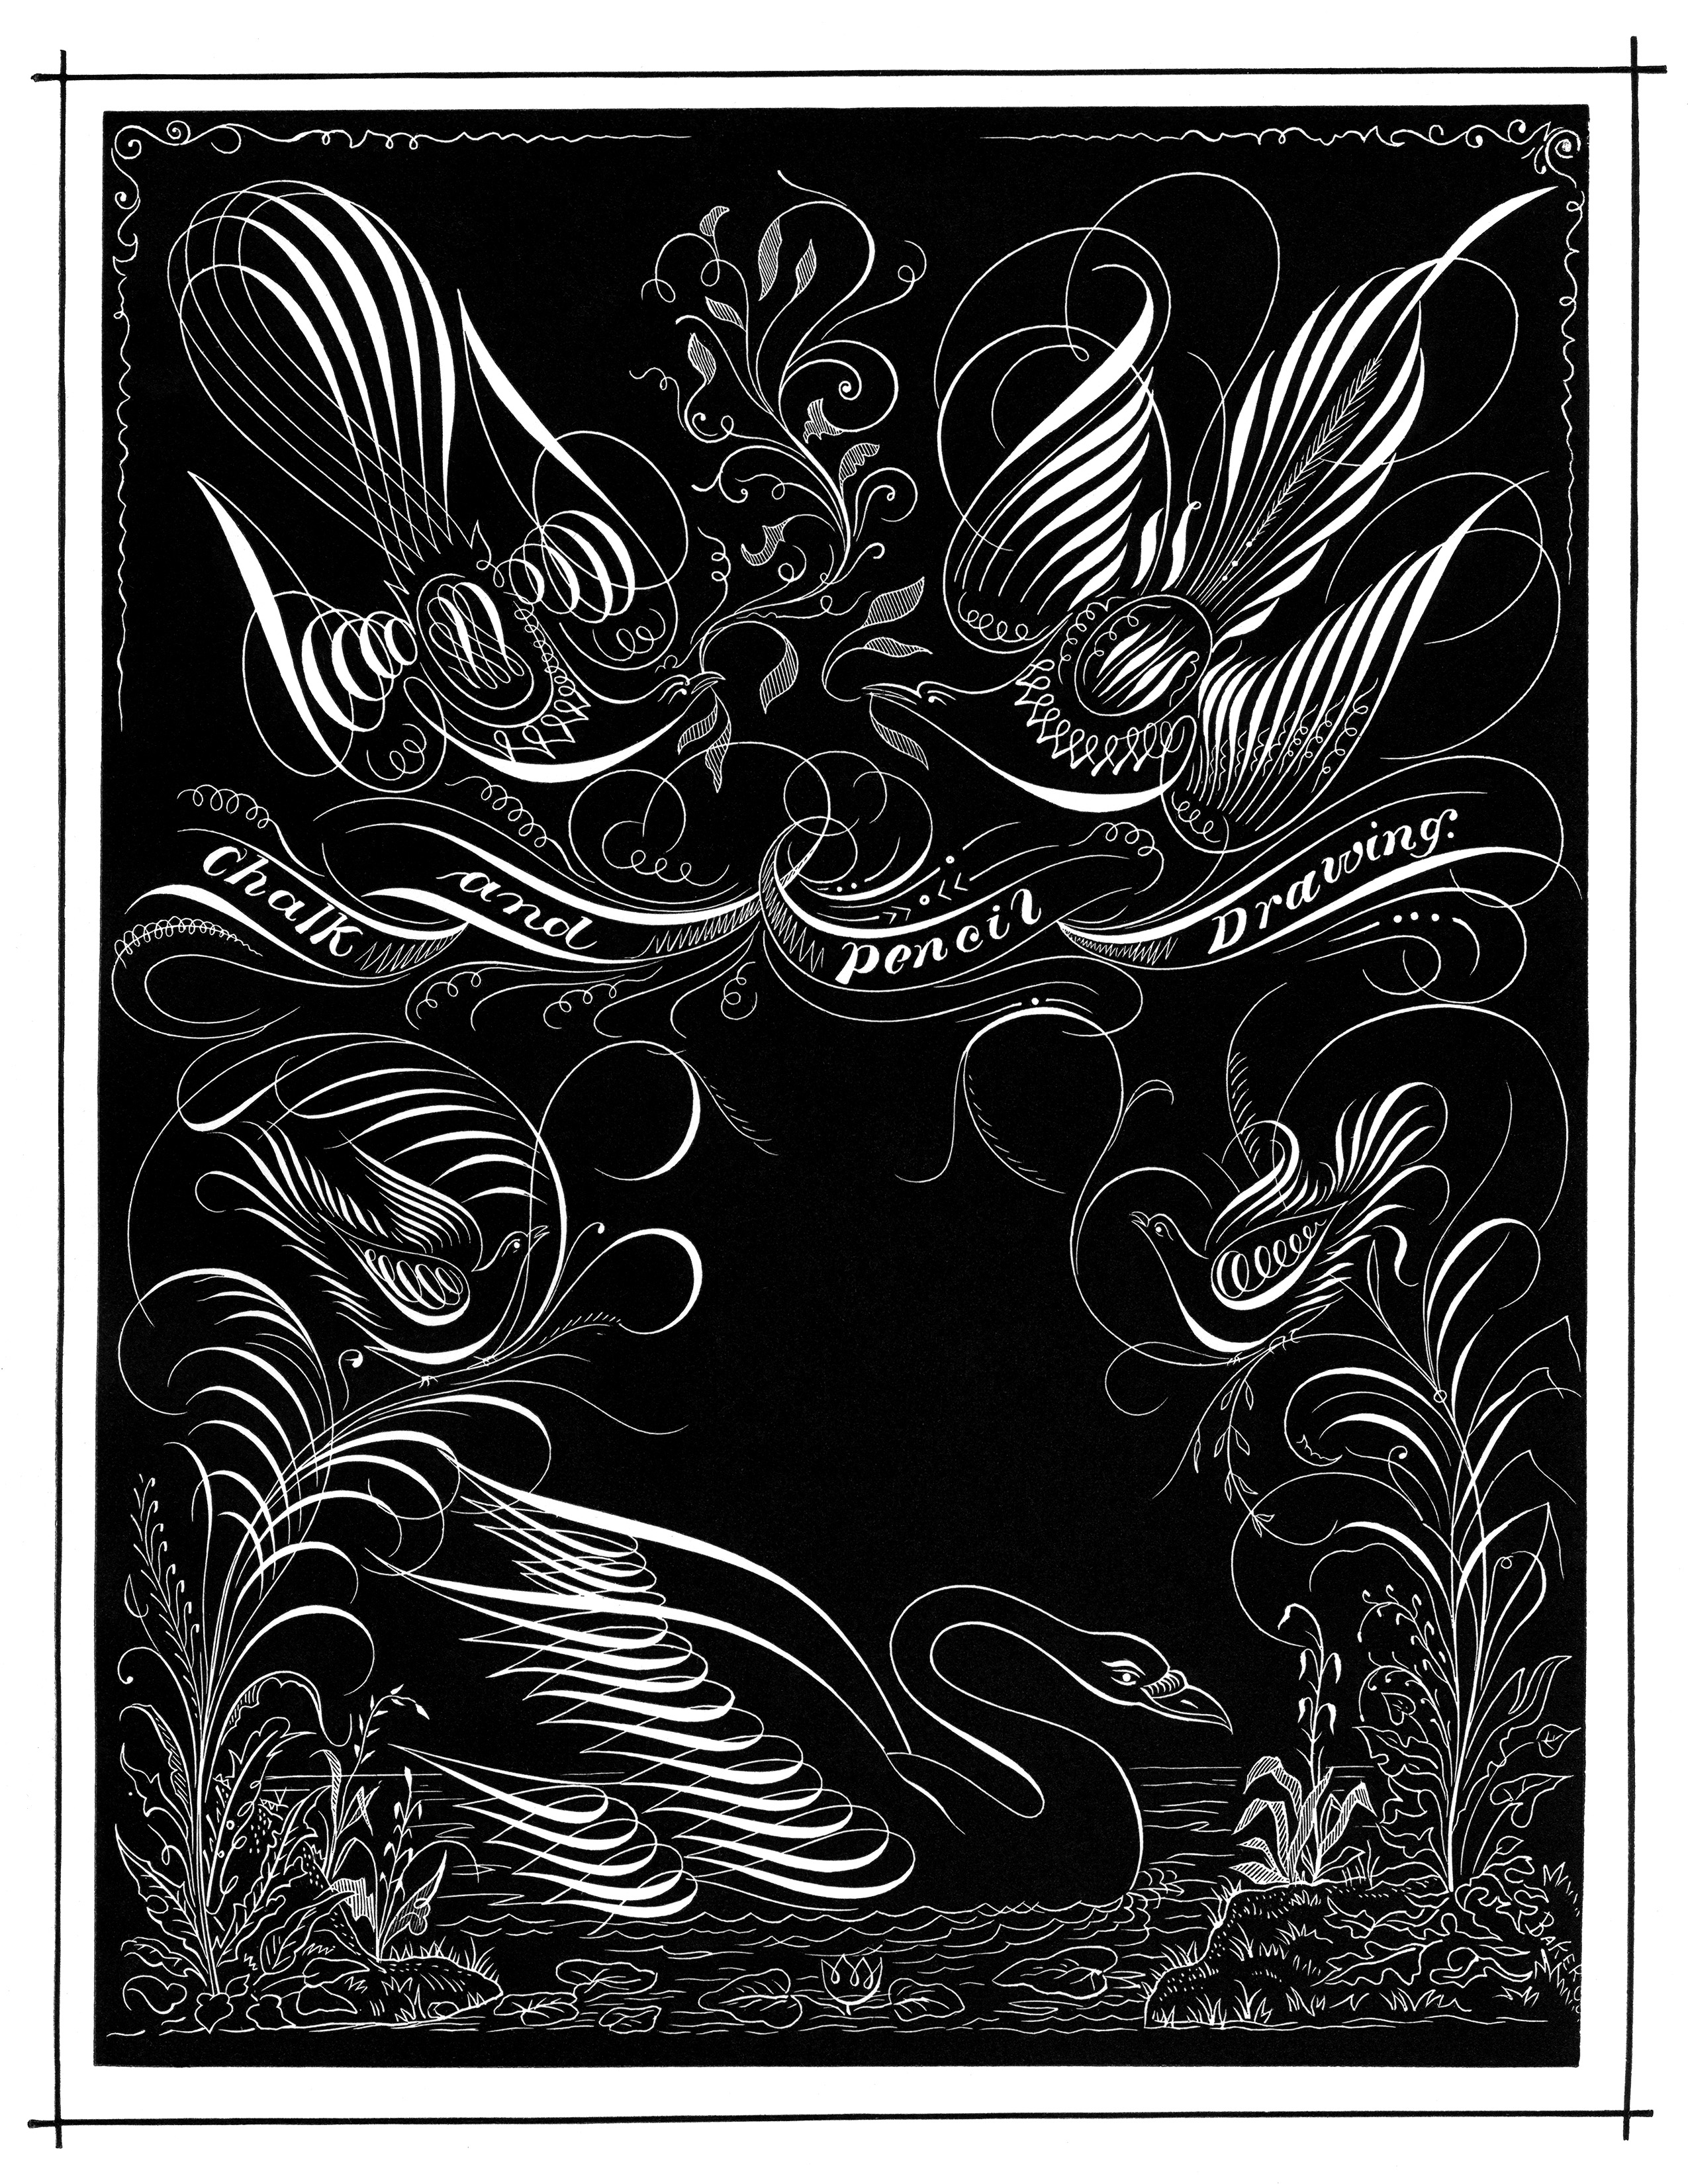 chalk and pencil drawing, swirl ornamental graphic, black and white clipart, flourish sketch bird swan image, vintage penmanship art